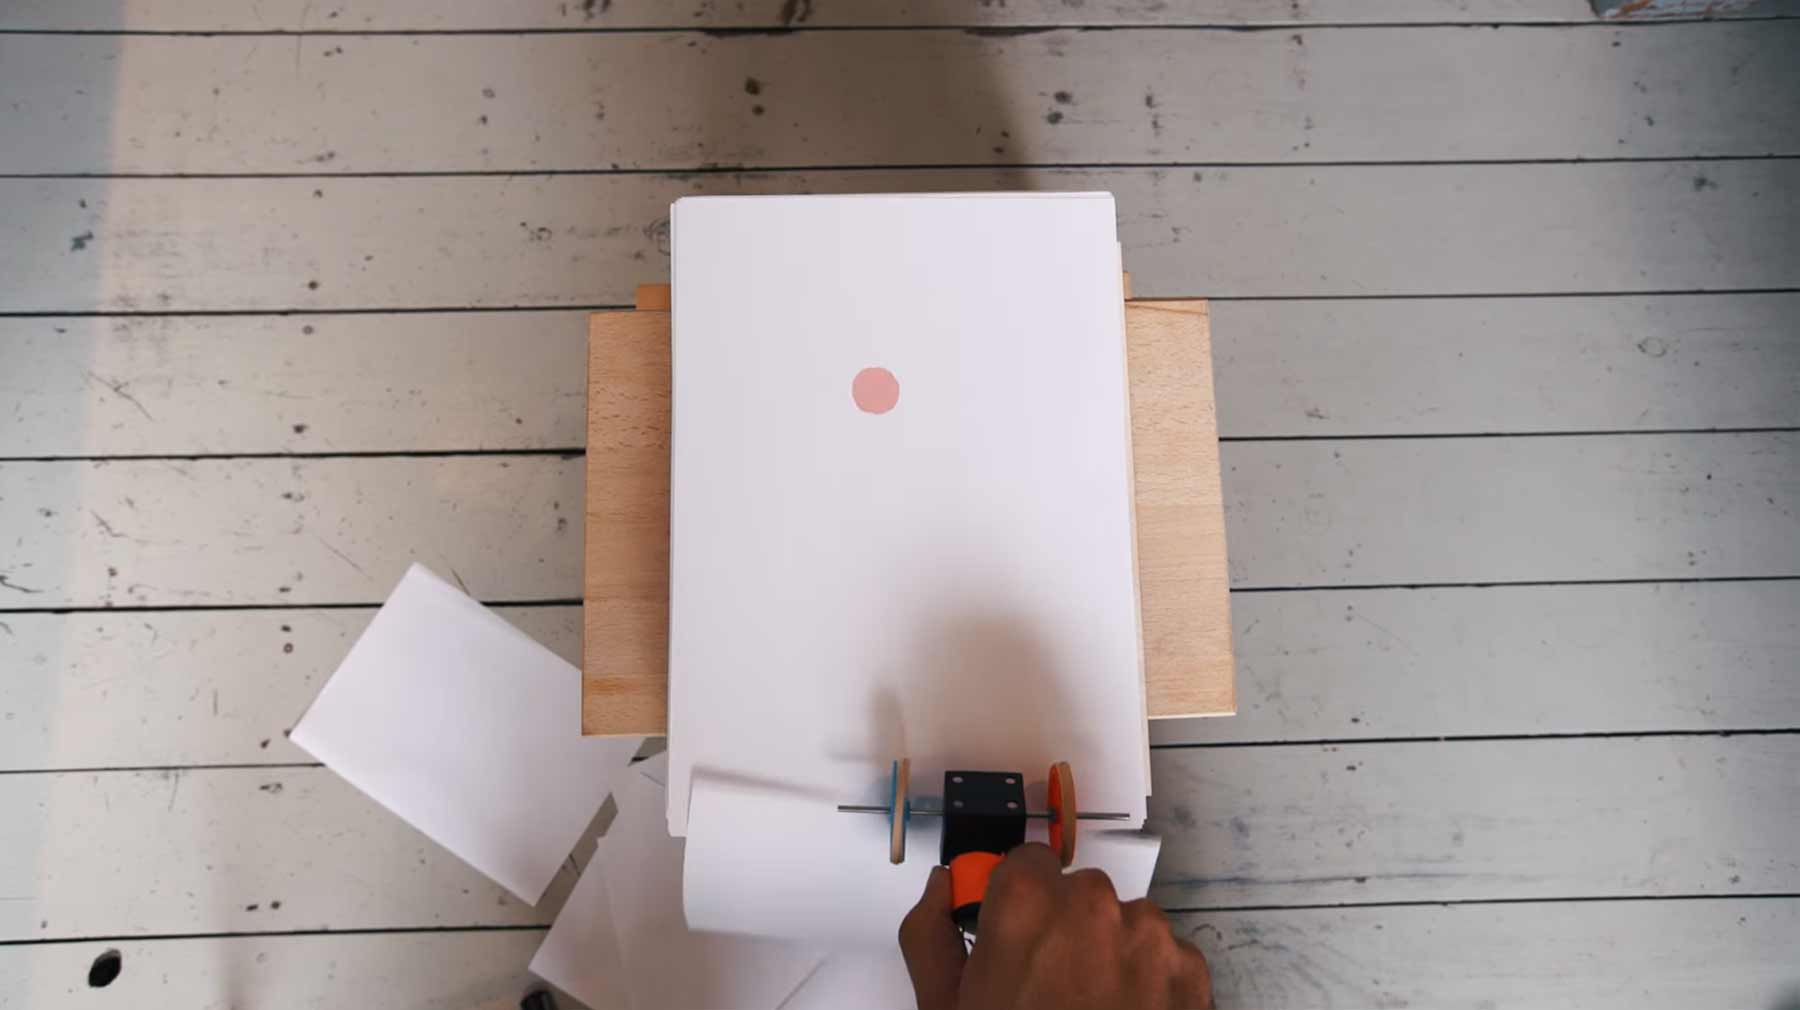 1.000 Blatt Papier wegziehen ergibt Animation 1000-blatt-animations-maschine